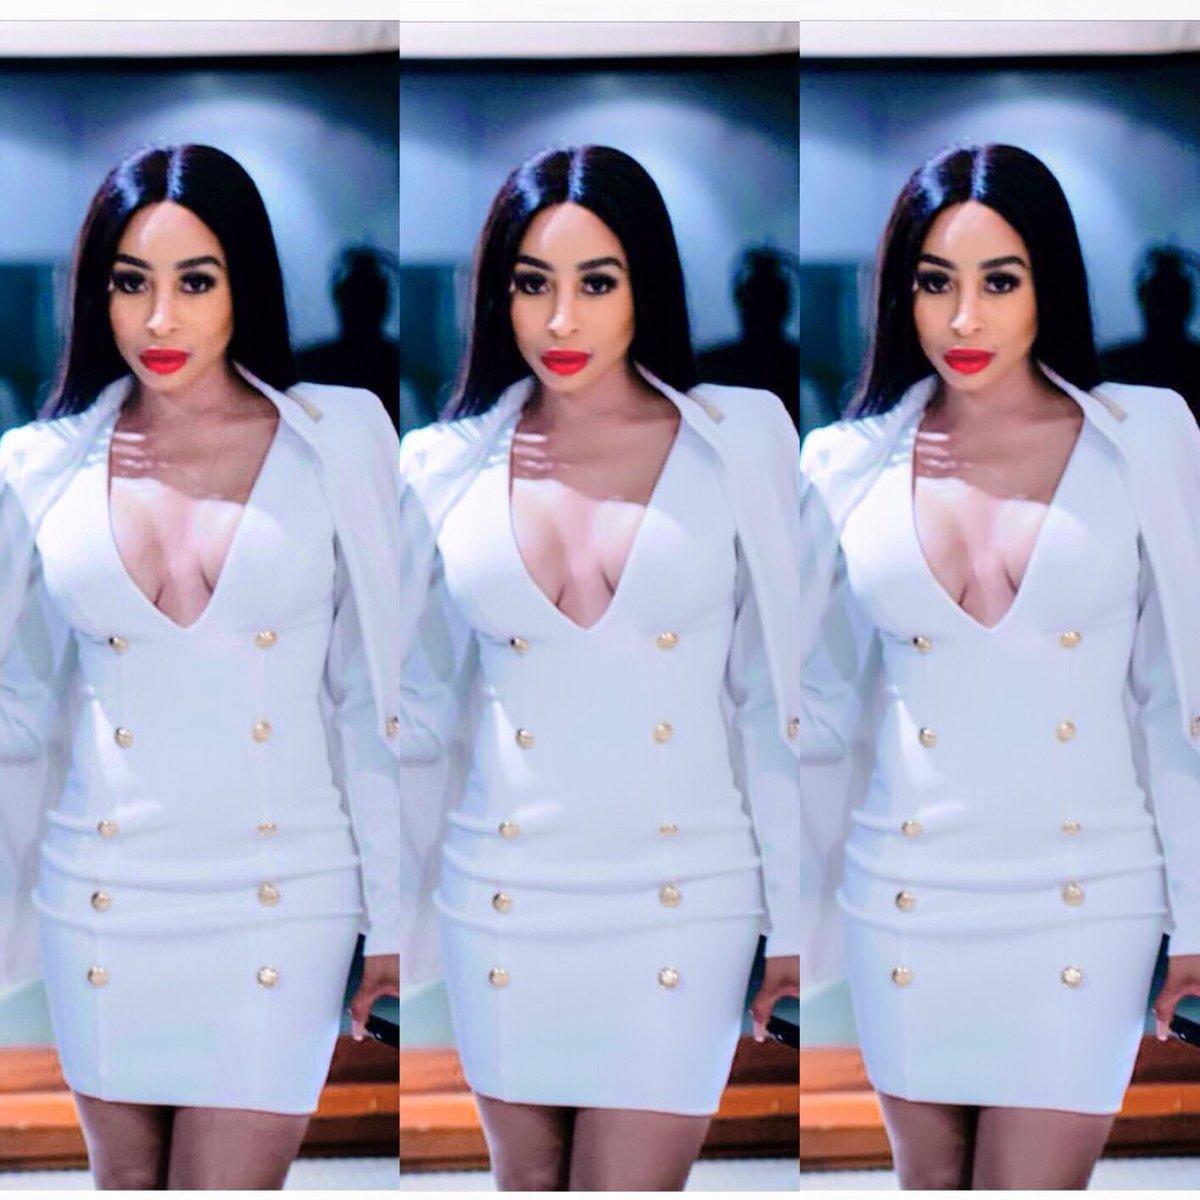 Cleavage Khanyi Mbau nude photos 2019